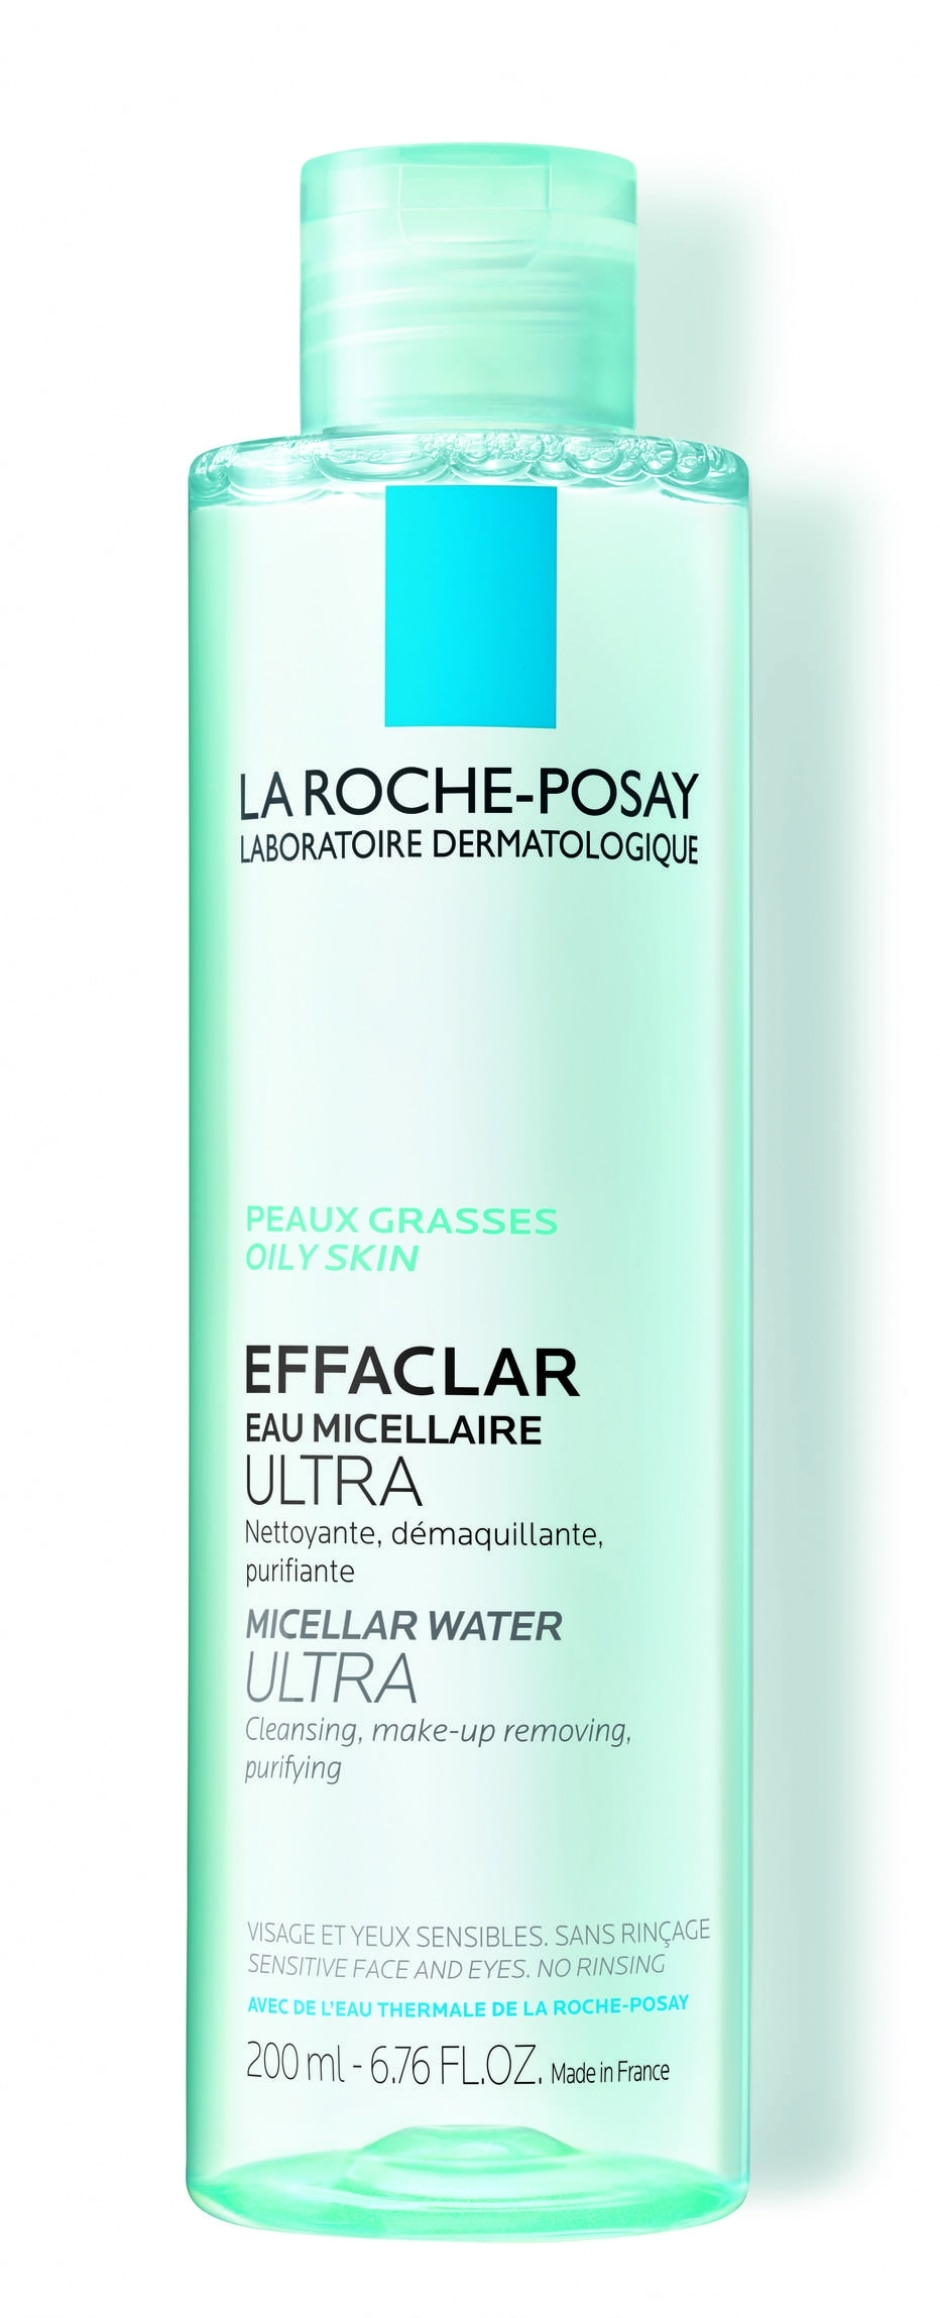 Divulgação/La Roche-Posay